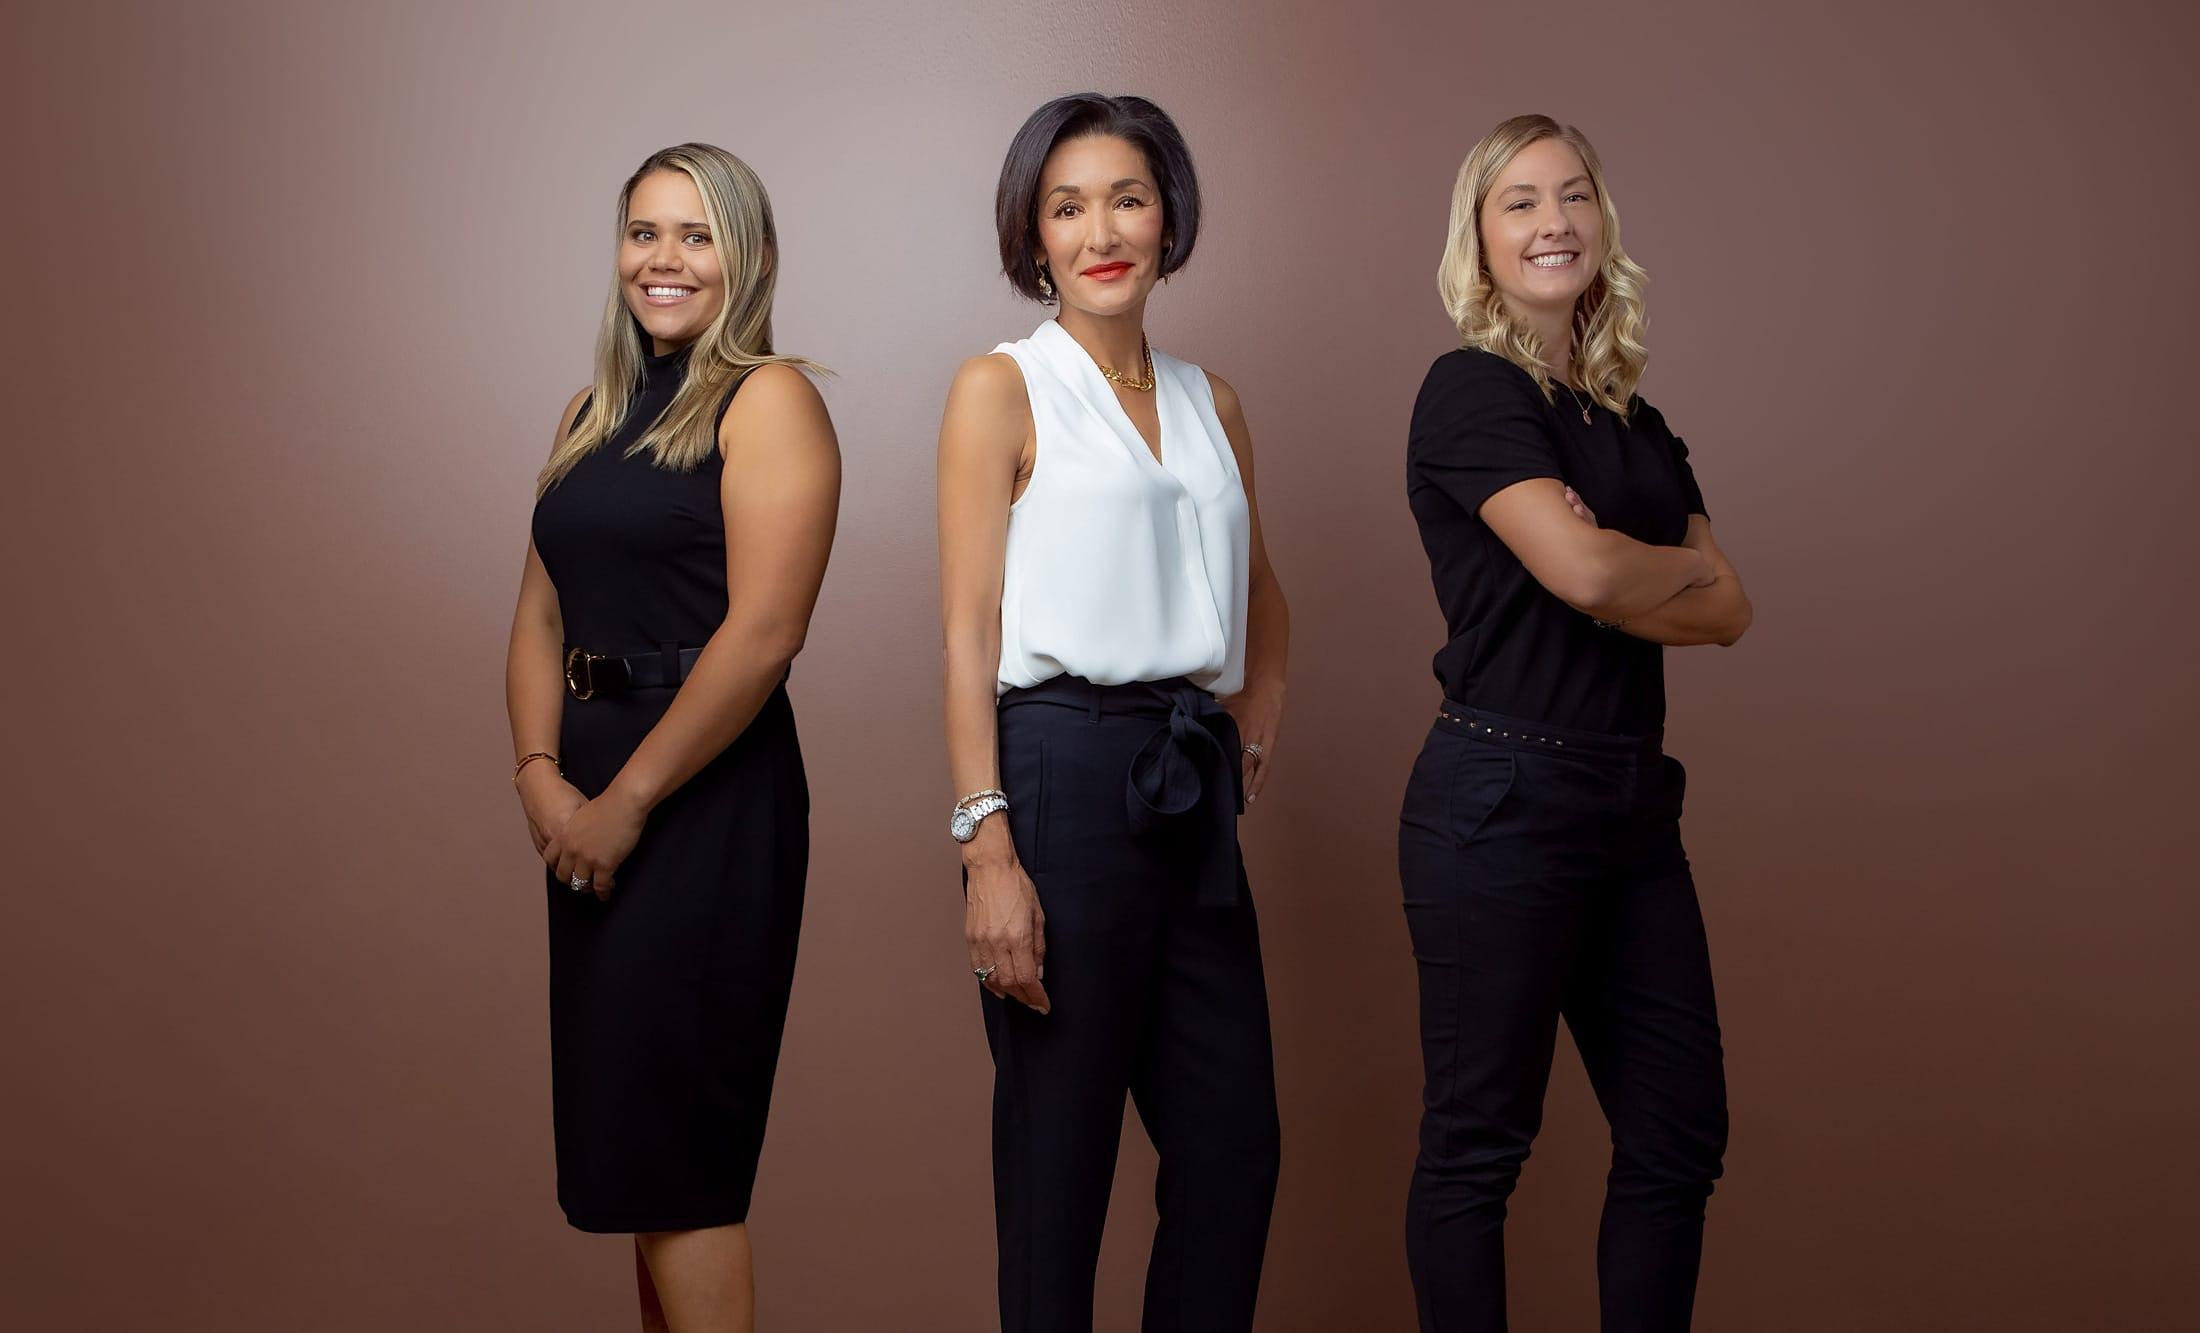 Dr. Salma Aziz, Dr. Petrina Yokay, and Dr. Jessica Arneson standing side by side